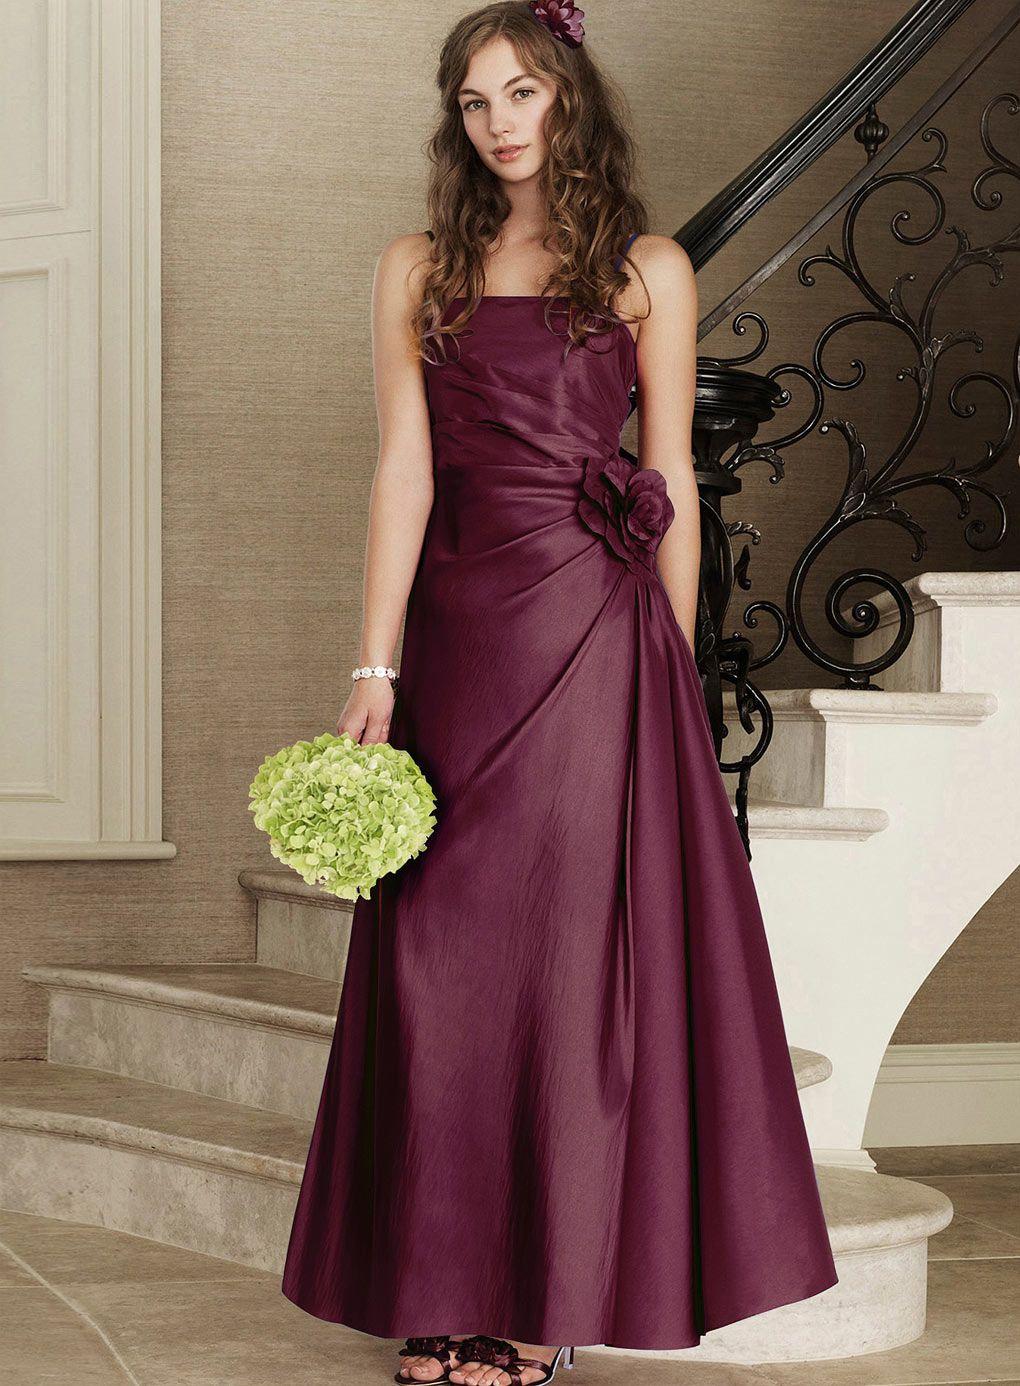 Bhs teen bridesmaid dress teen clothesjust cute stuff bhs teen bridesmaid dress ombrellifo Image collections